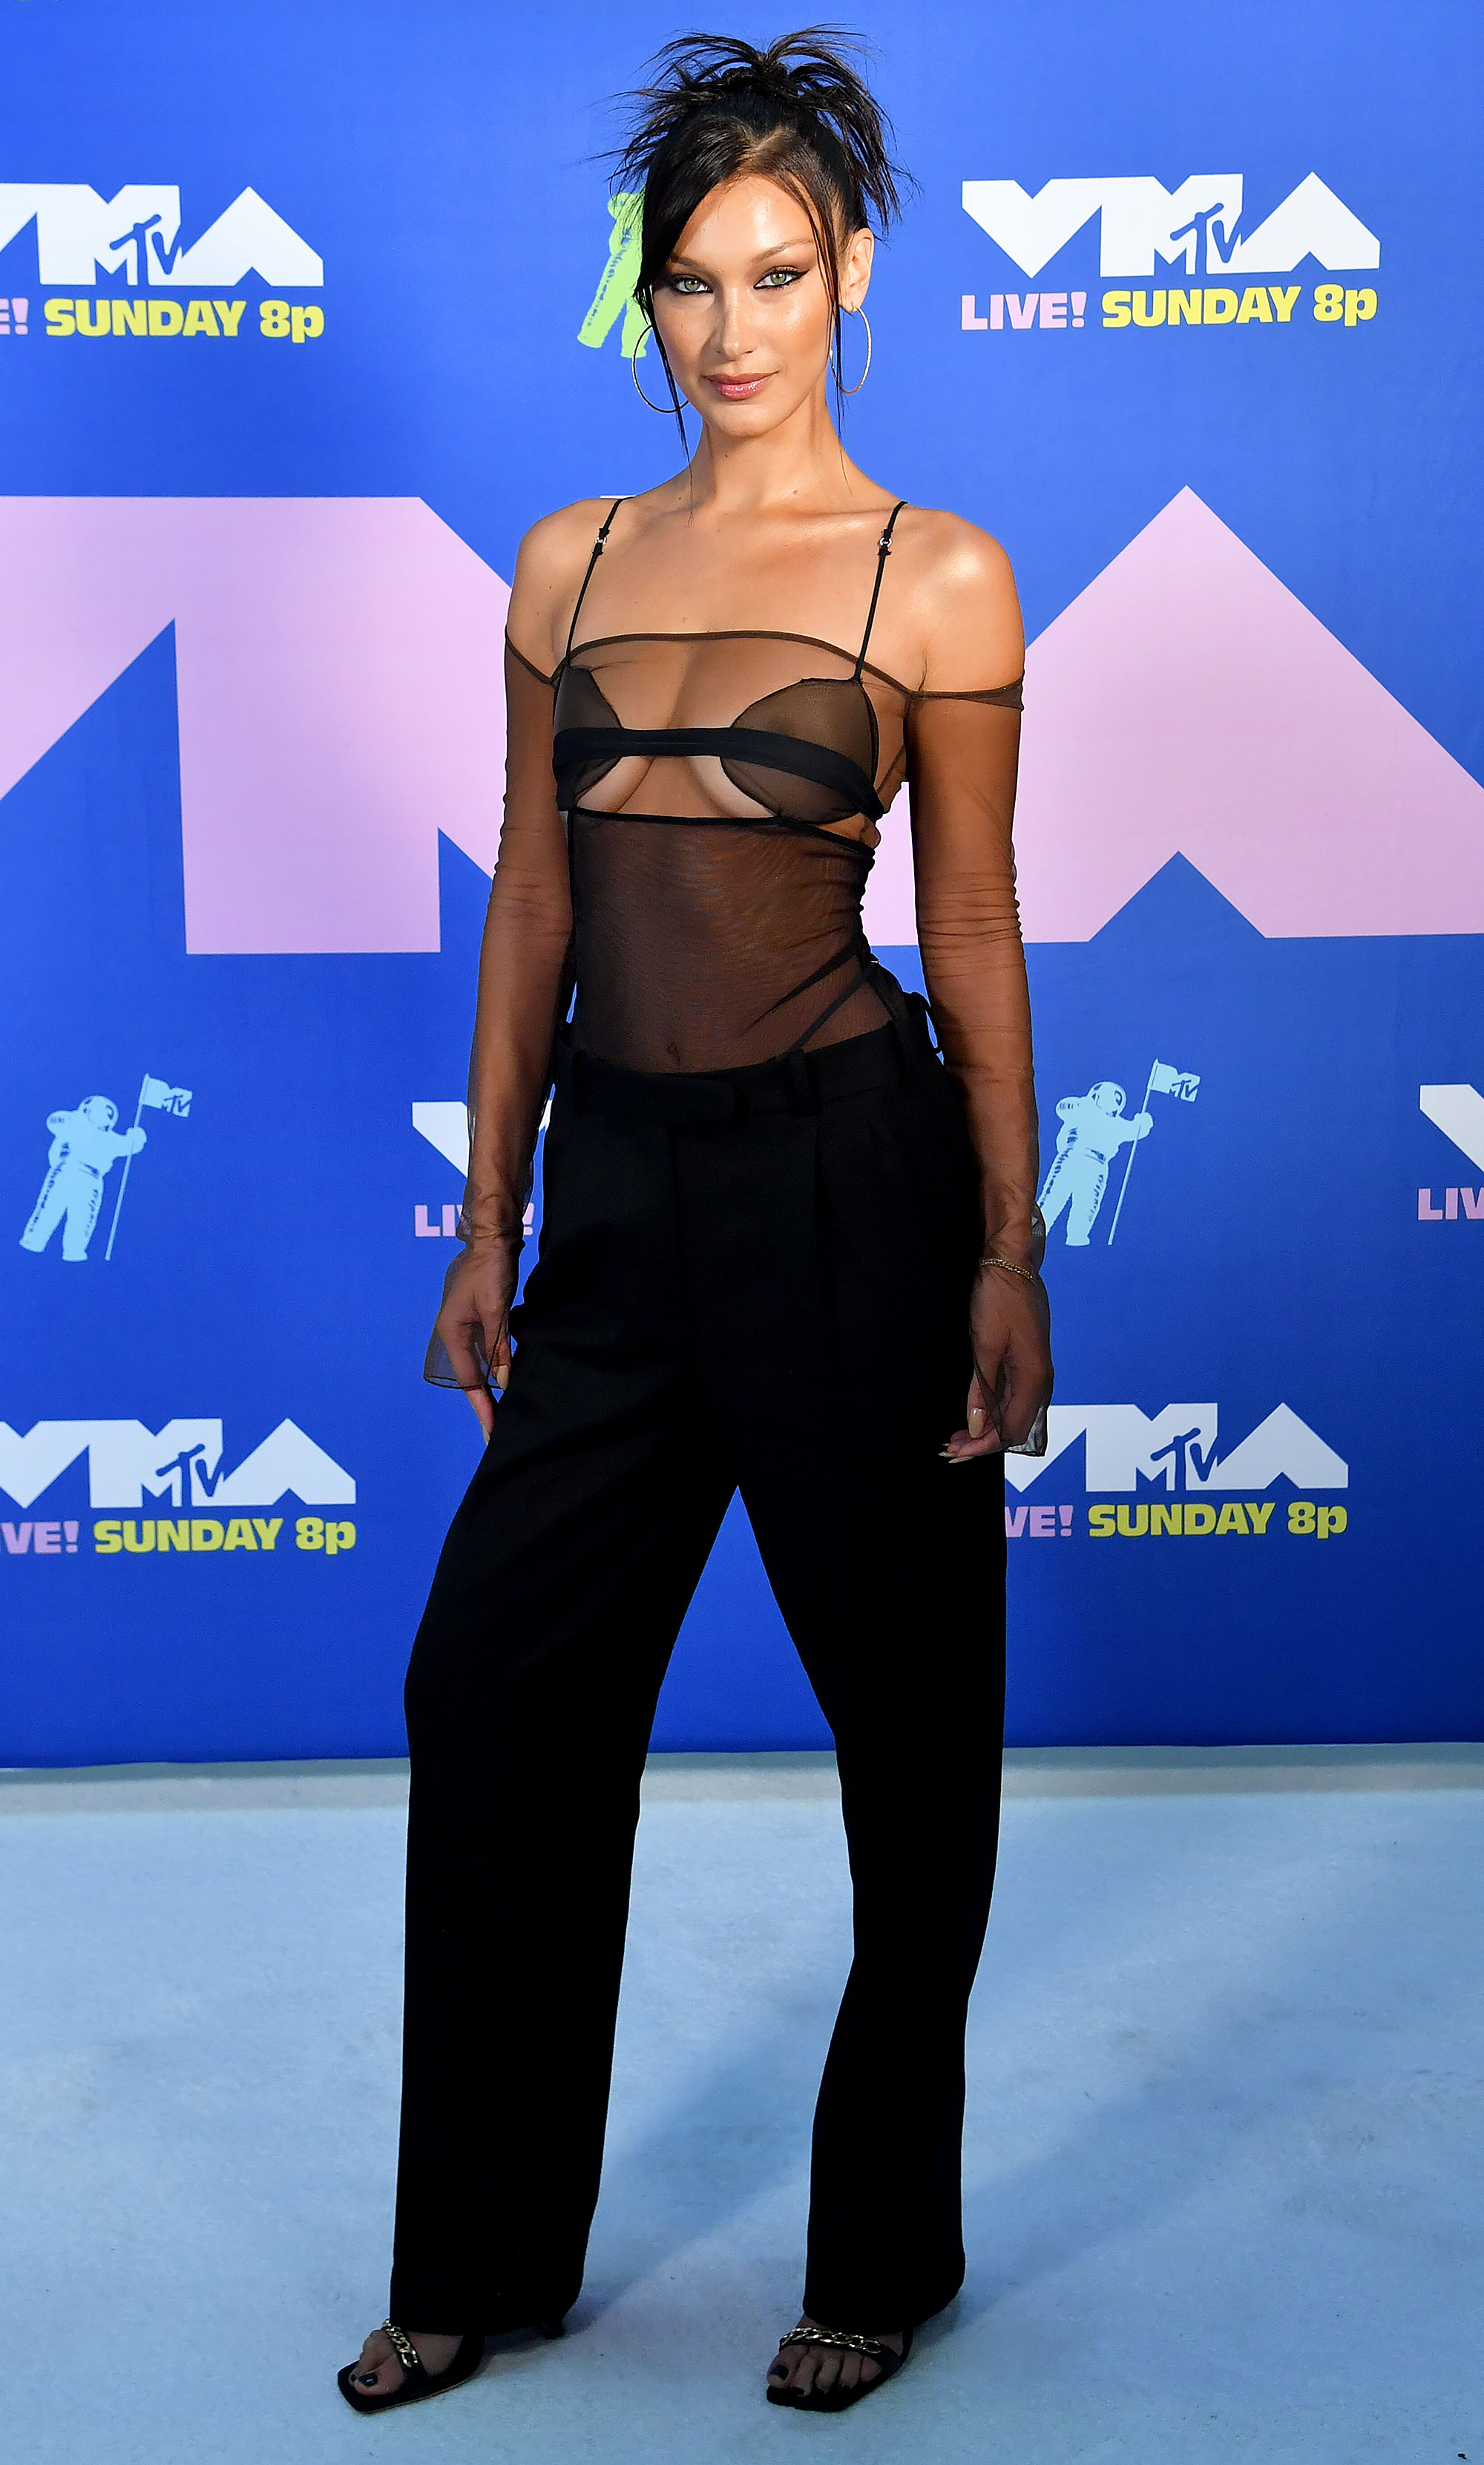 VMAs 2020: Best Celebrity Red Carpet Fashion: Pics